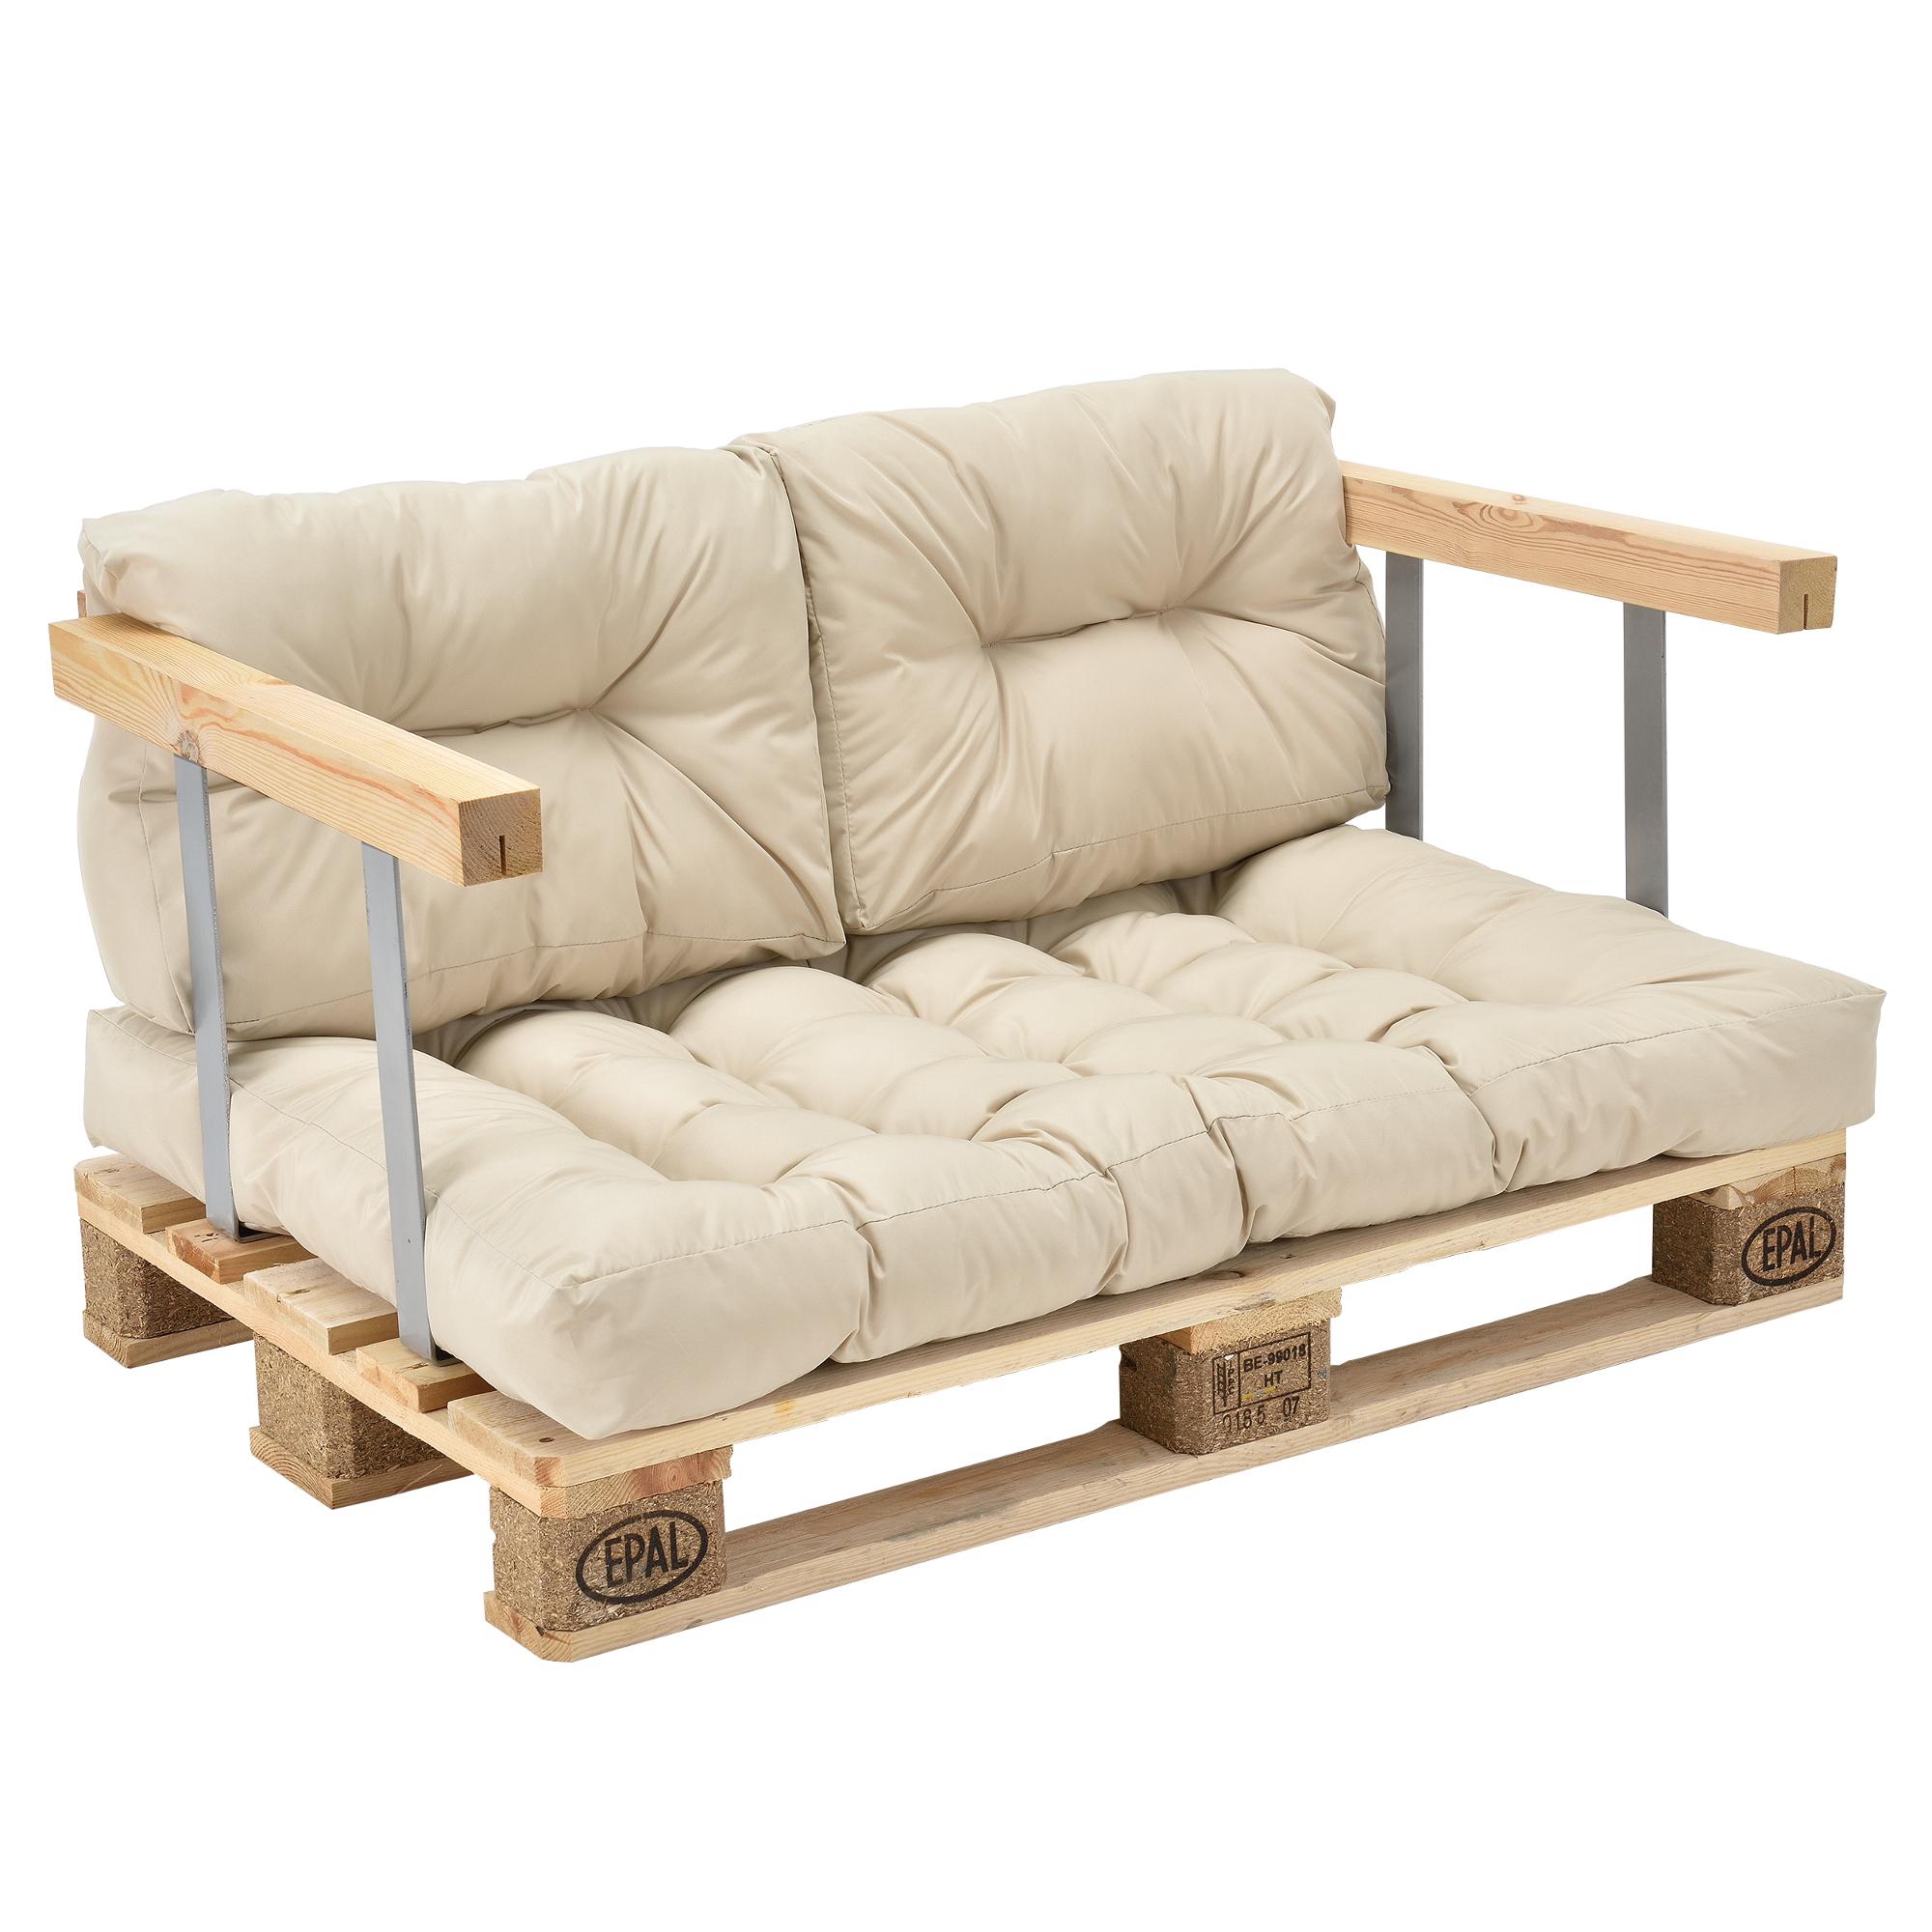 canap d angle en palettes 3x coussin de si ge dossier beige ebay. Black Bedroom Furniture Sets. Home Design Ideas